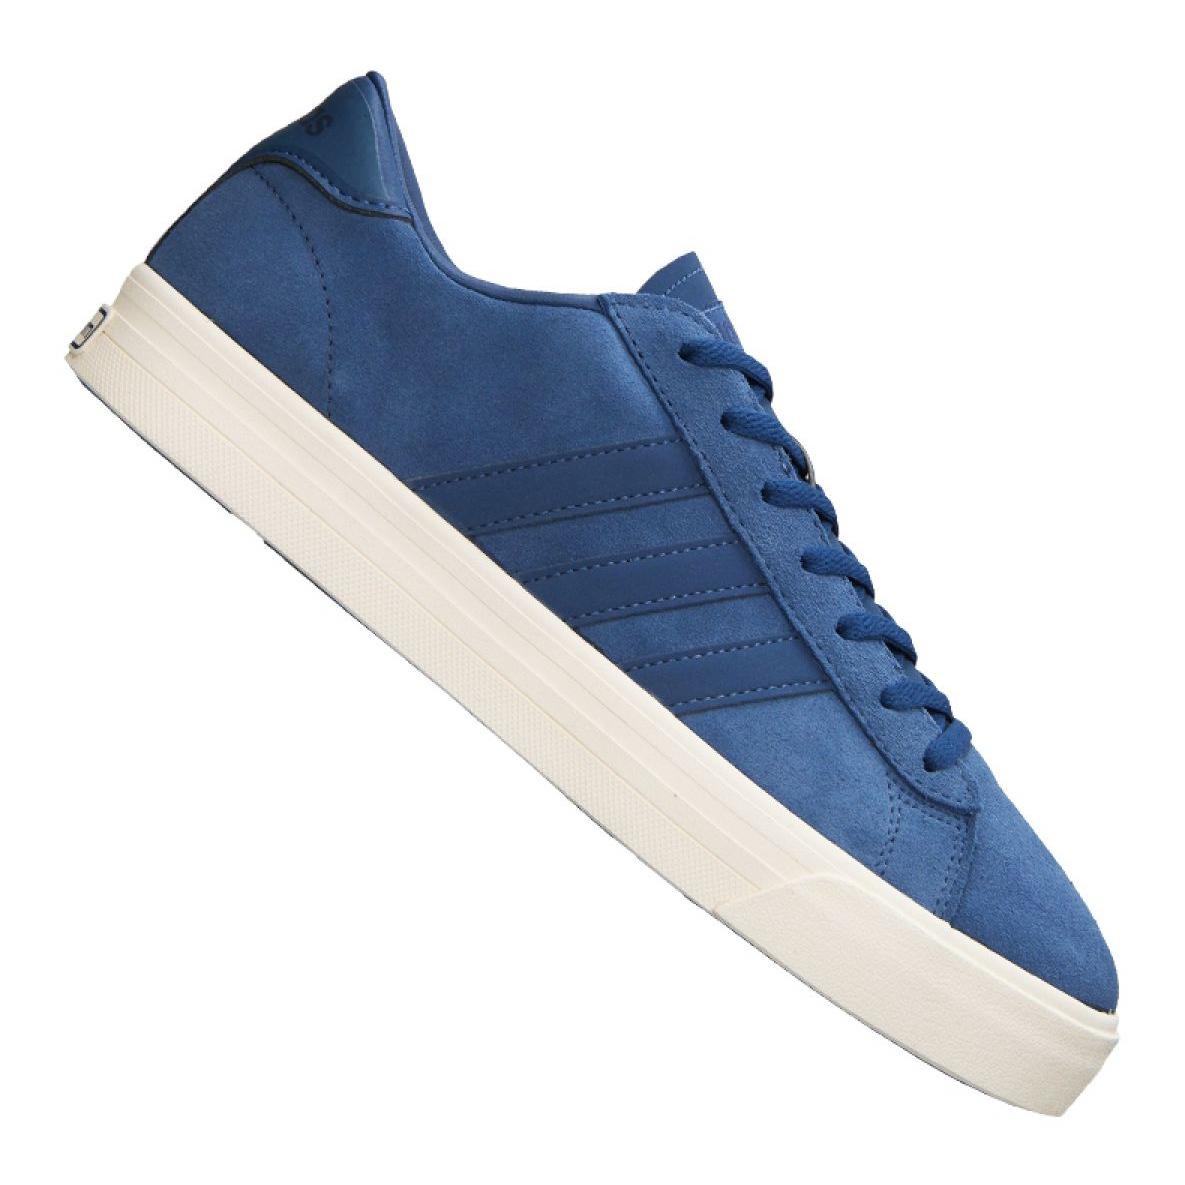 Adidas Cloudfoam Super Daily M AW3904 shoes blue